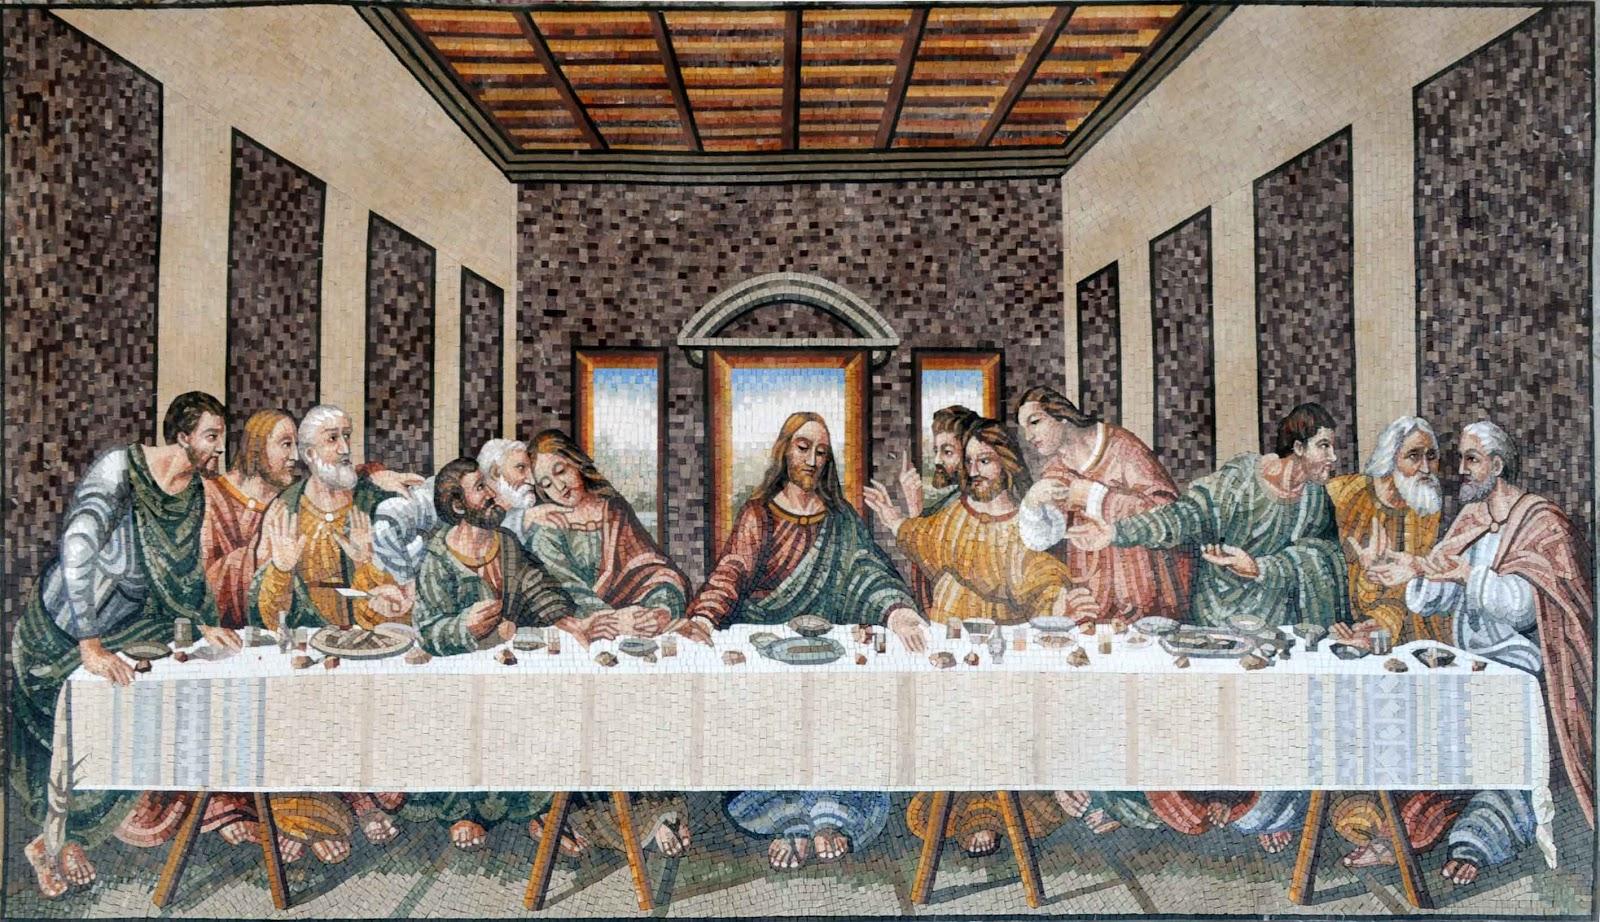 The Last Supper by Leonardo da Vince Mosaic Reproduction